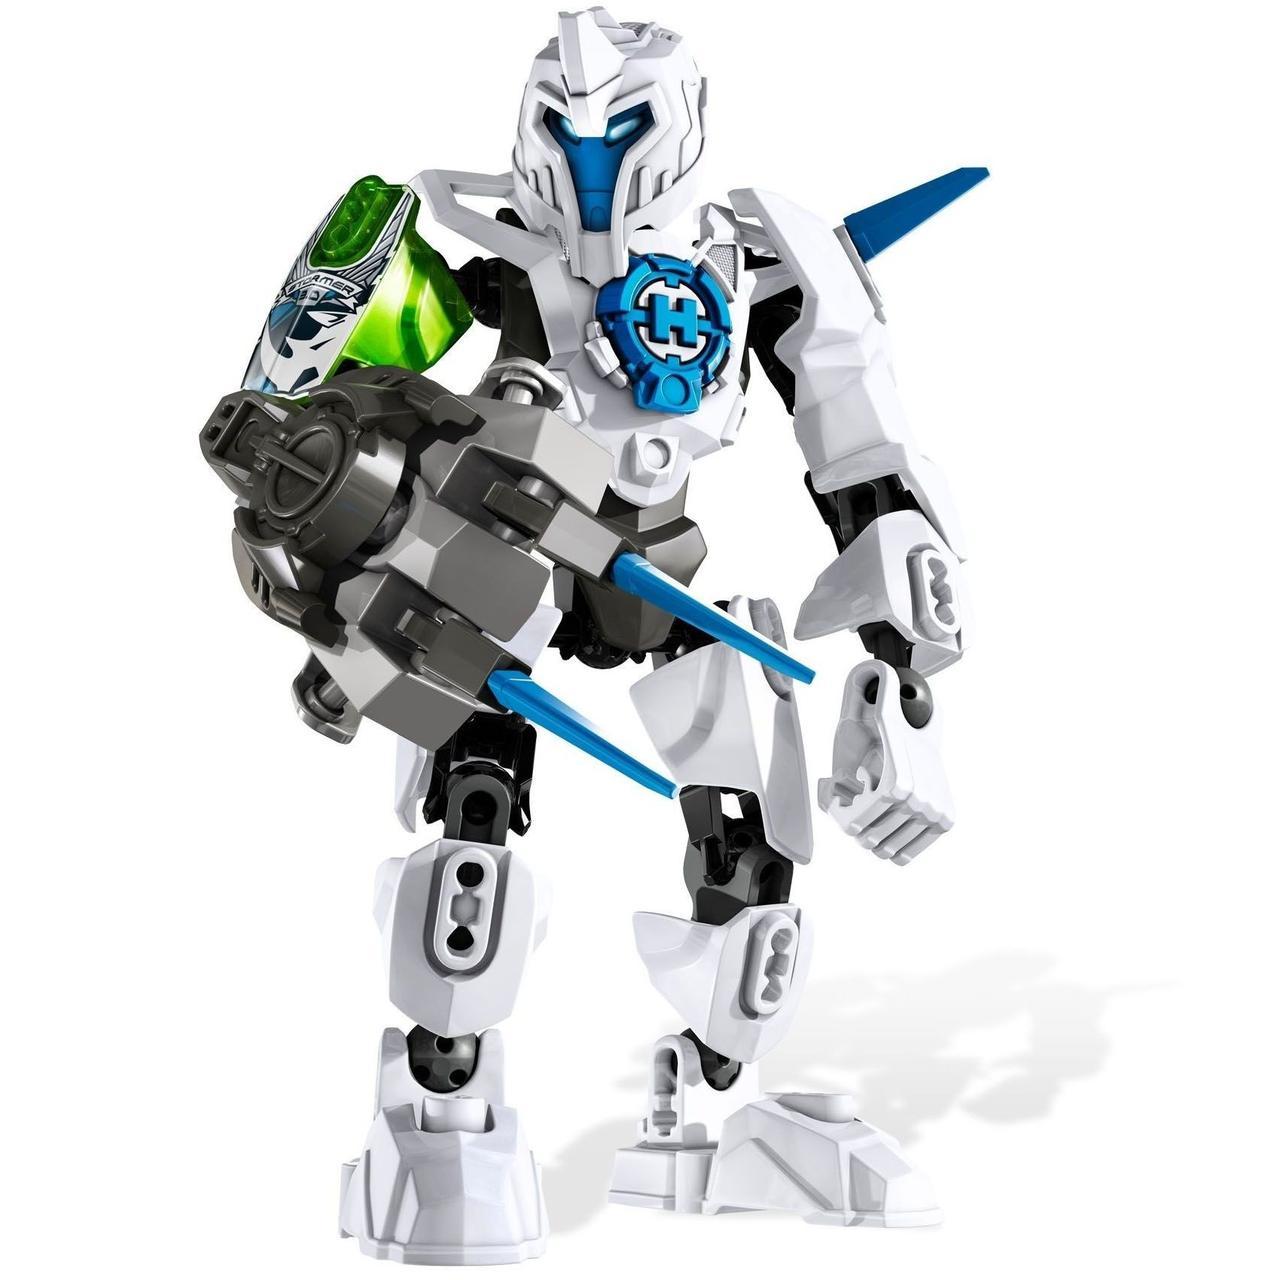 Decool 9602 HERO3 Конструктор-робот Stormer (Аналог LEGO Hero Factory 2145)